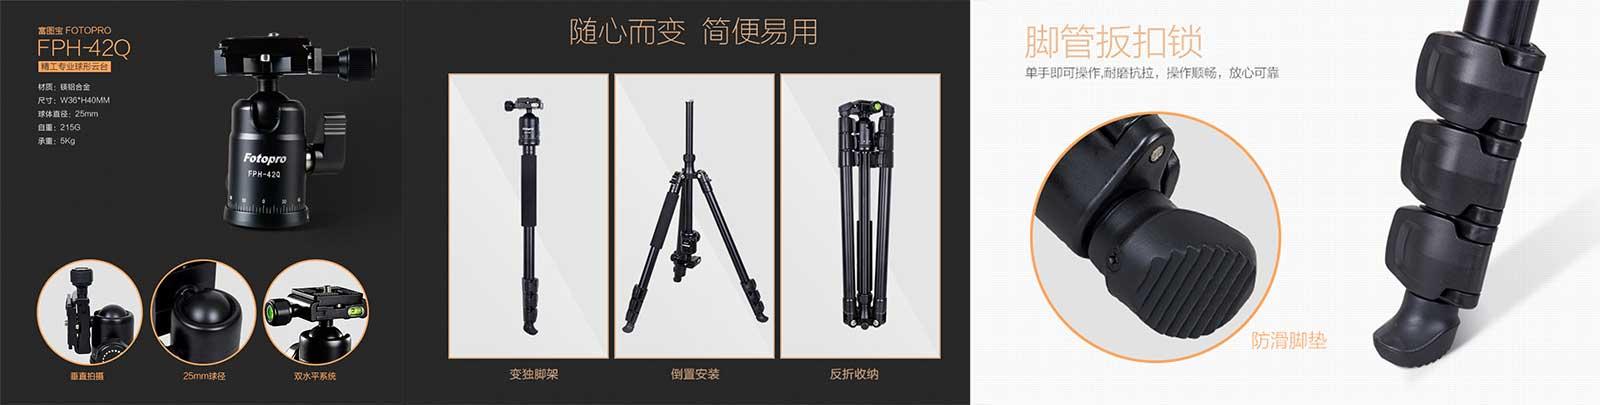 Fotopro S4plus+42Q Black Tripod toko kamera online plazakamera surabaya dan jakarta